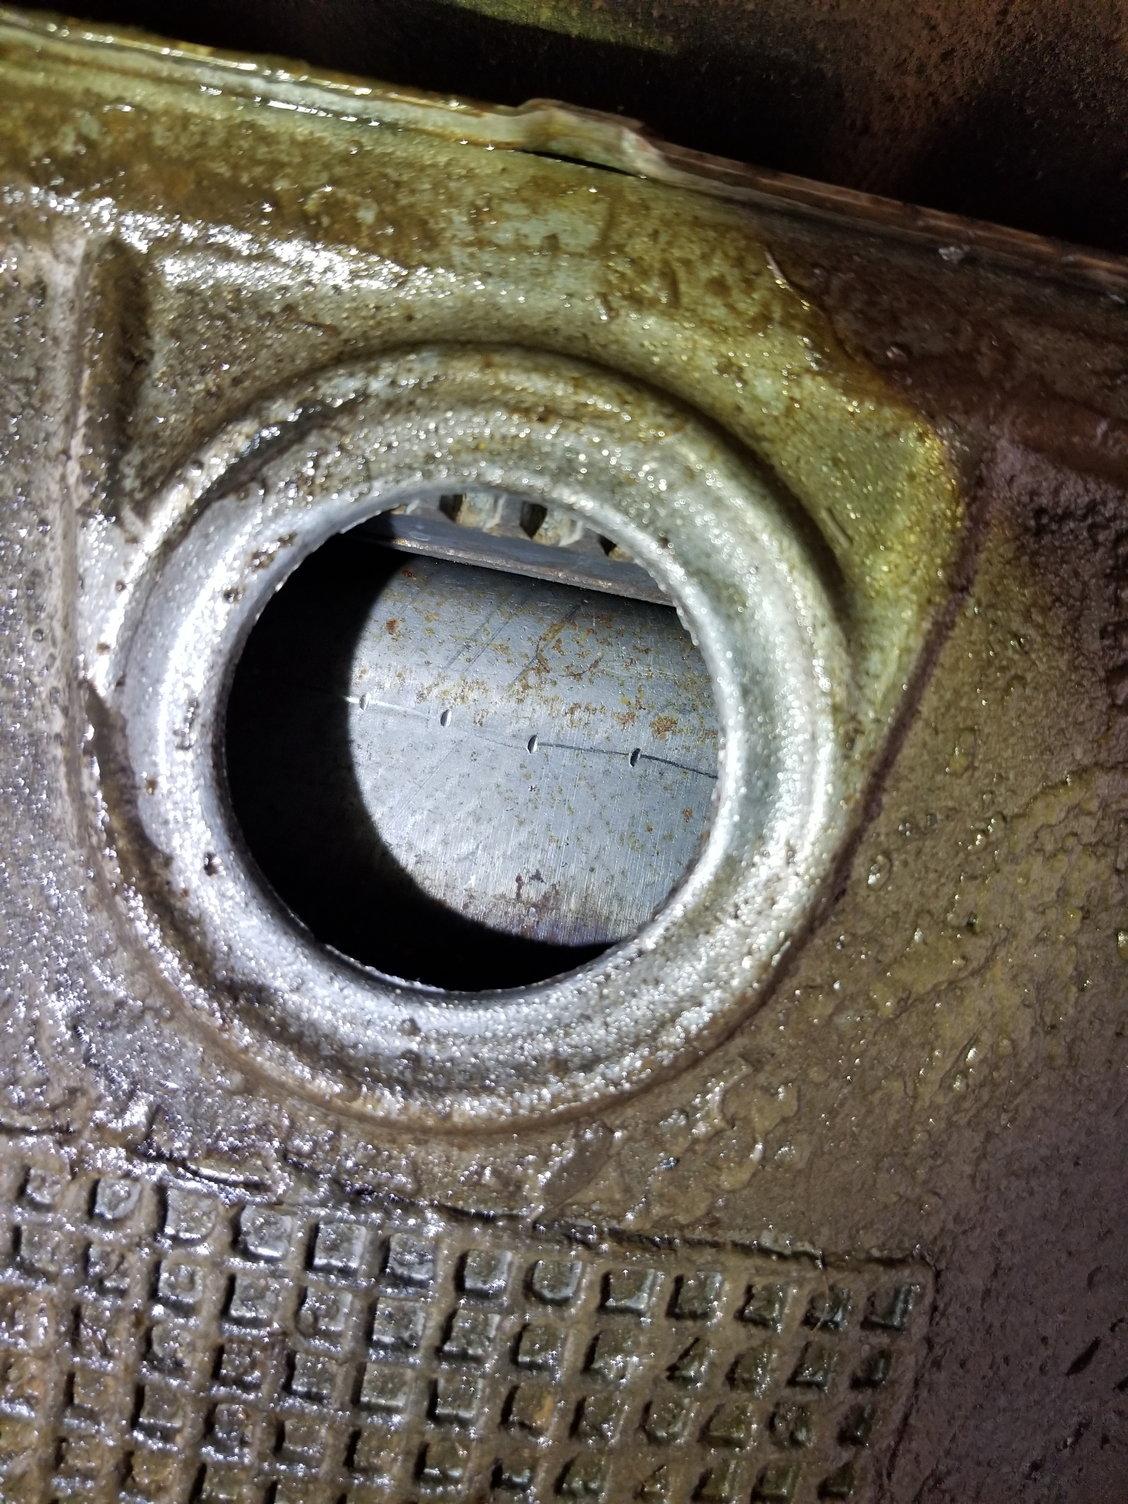 Torque converter rattle? - F150online Forums